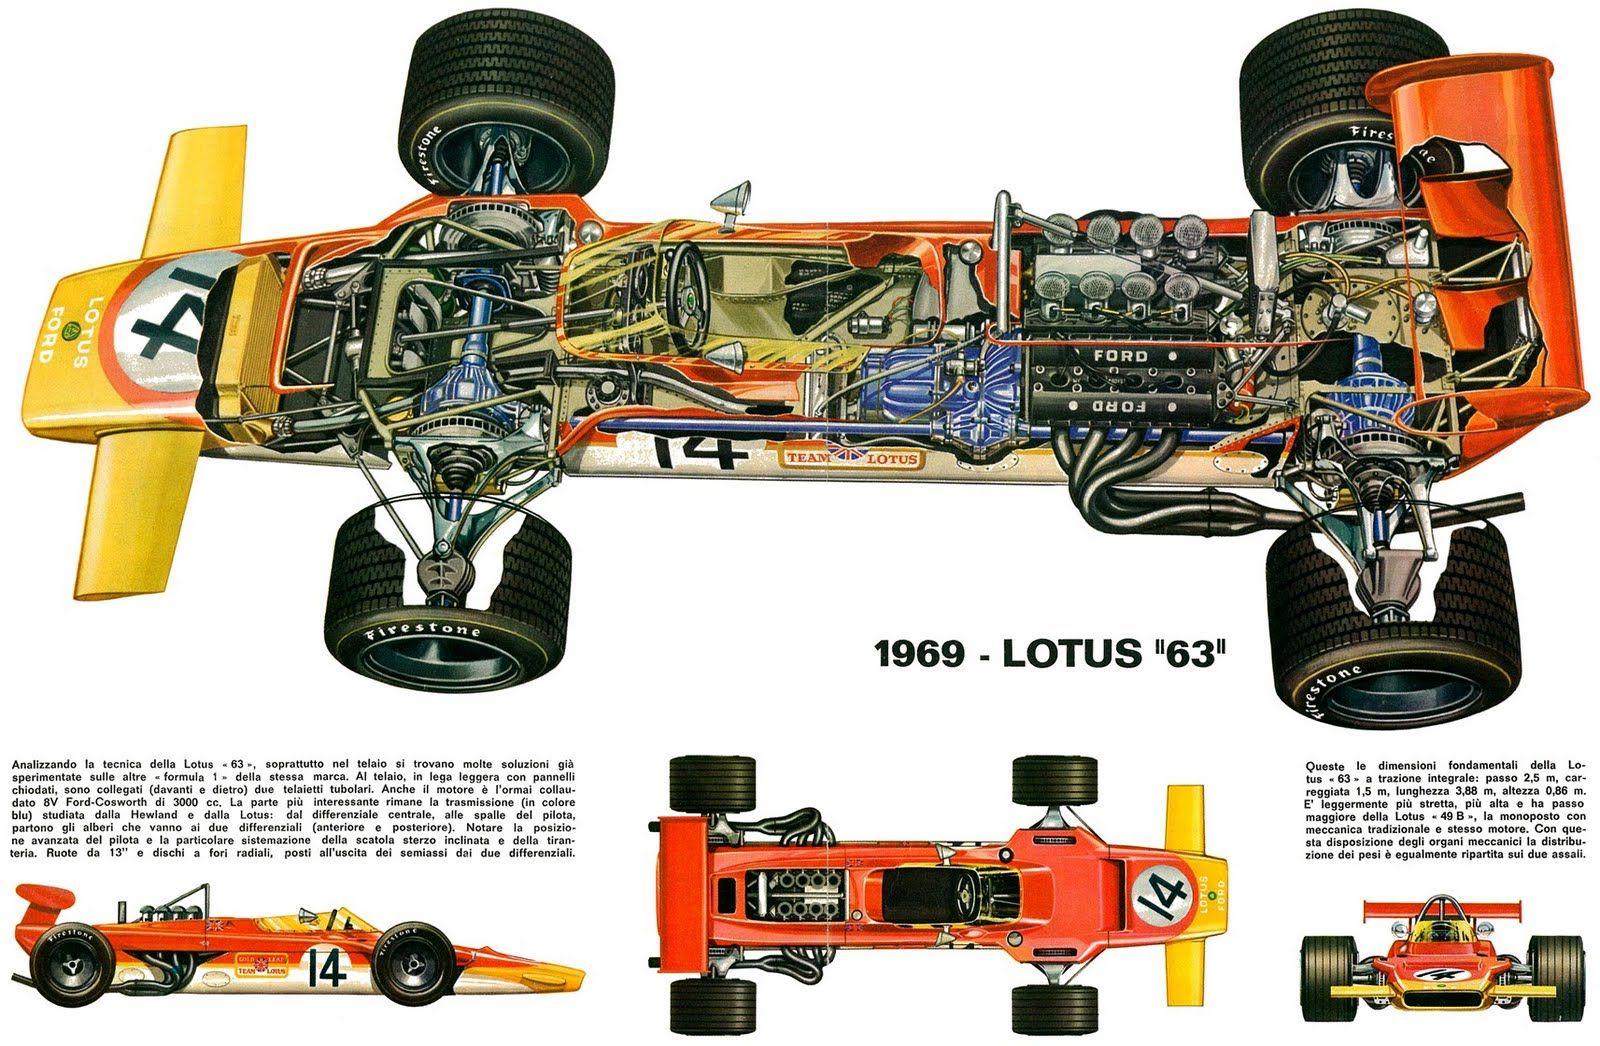 Lotus 63 4x4 Formula 1 Car Cutaway Formula 1 car